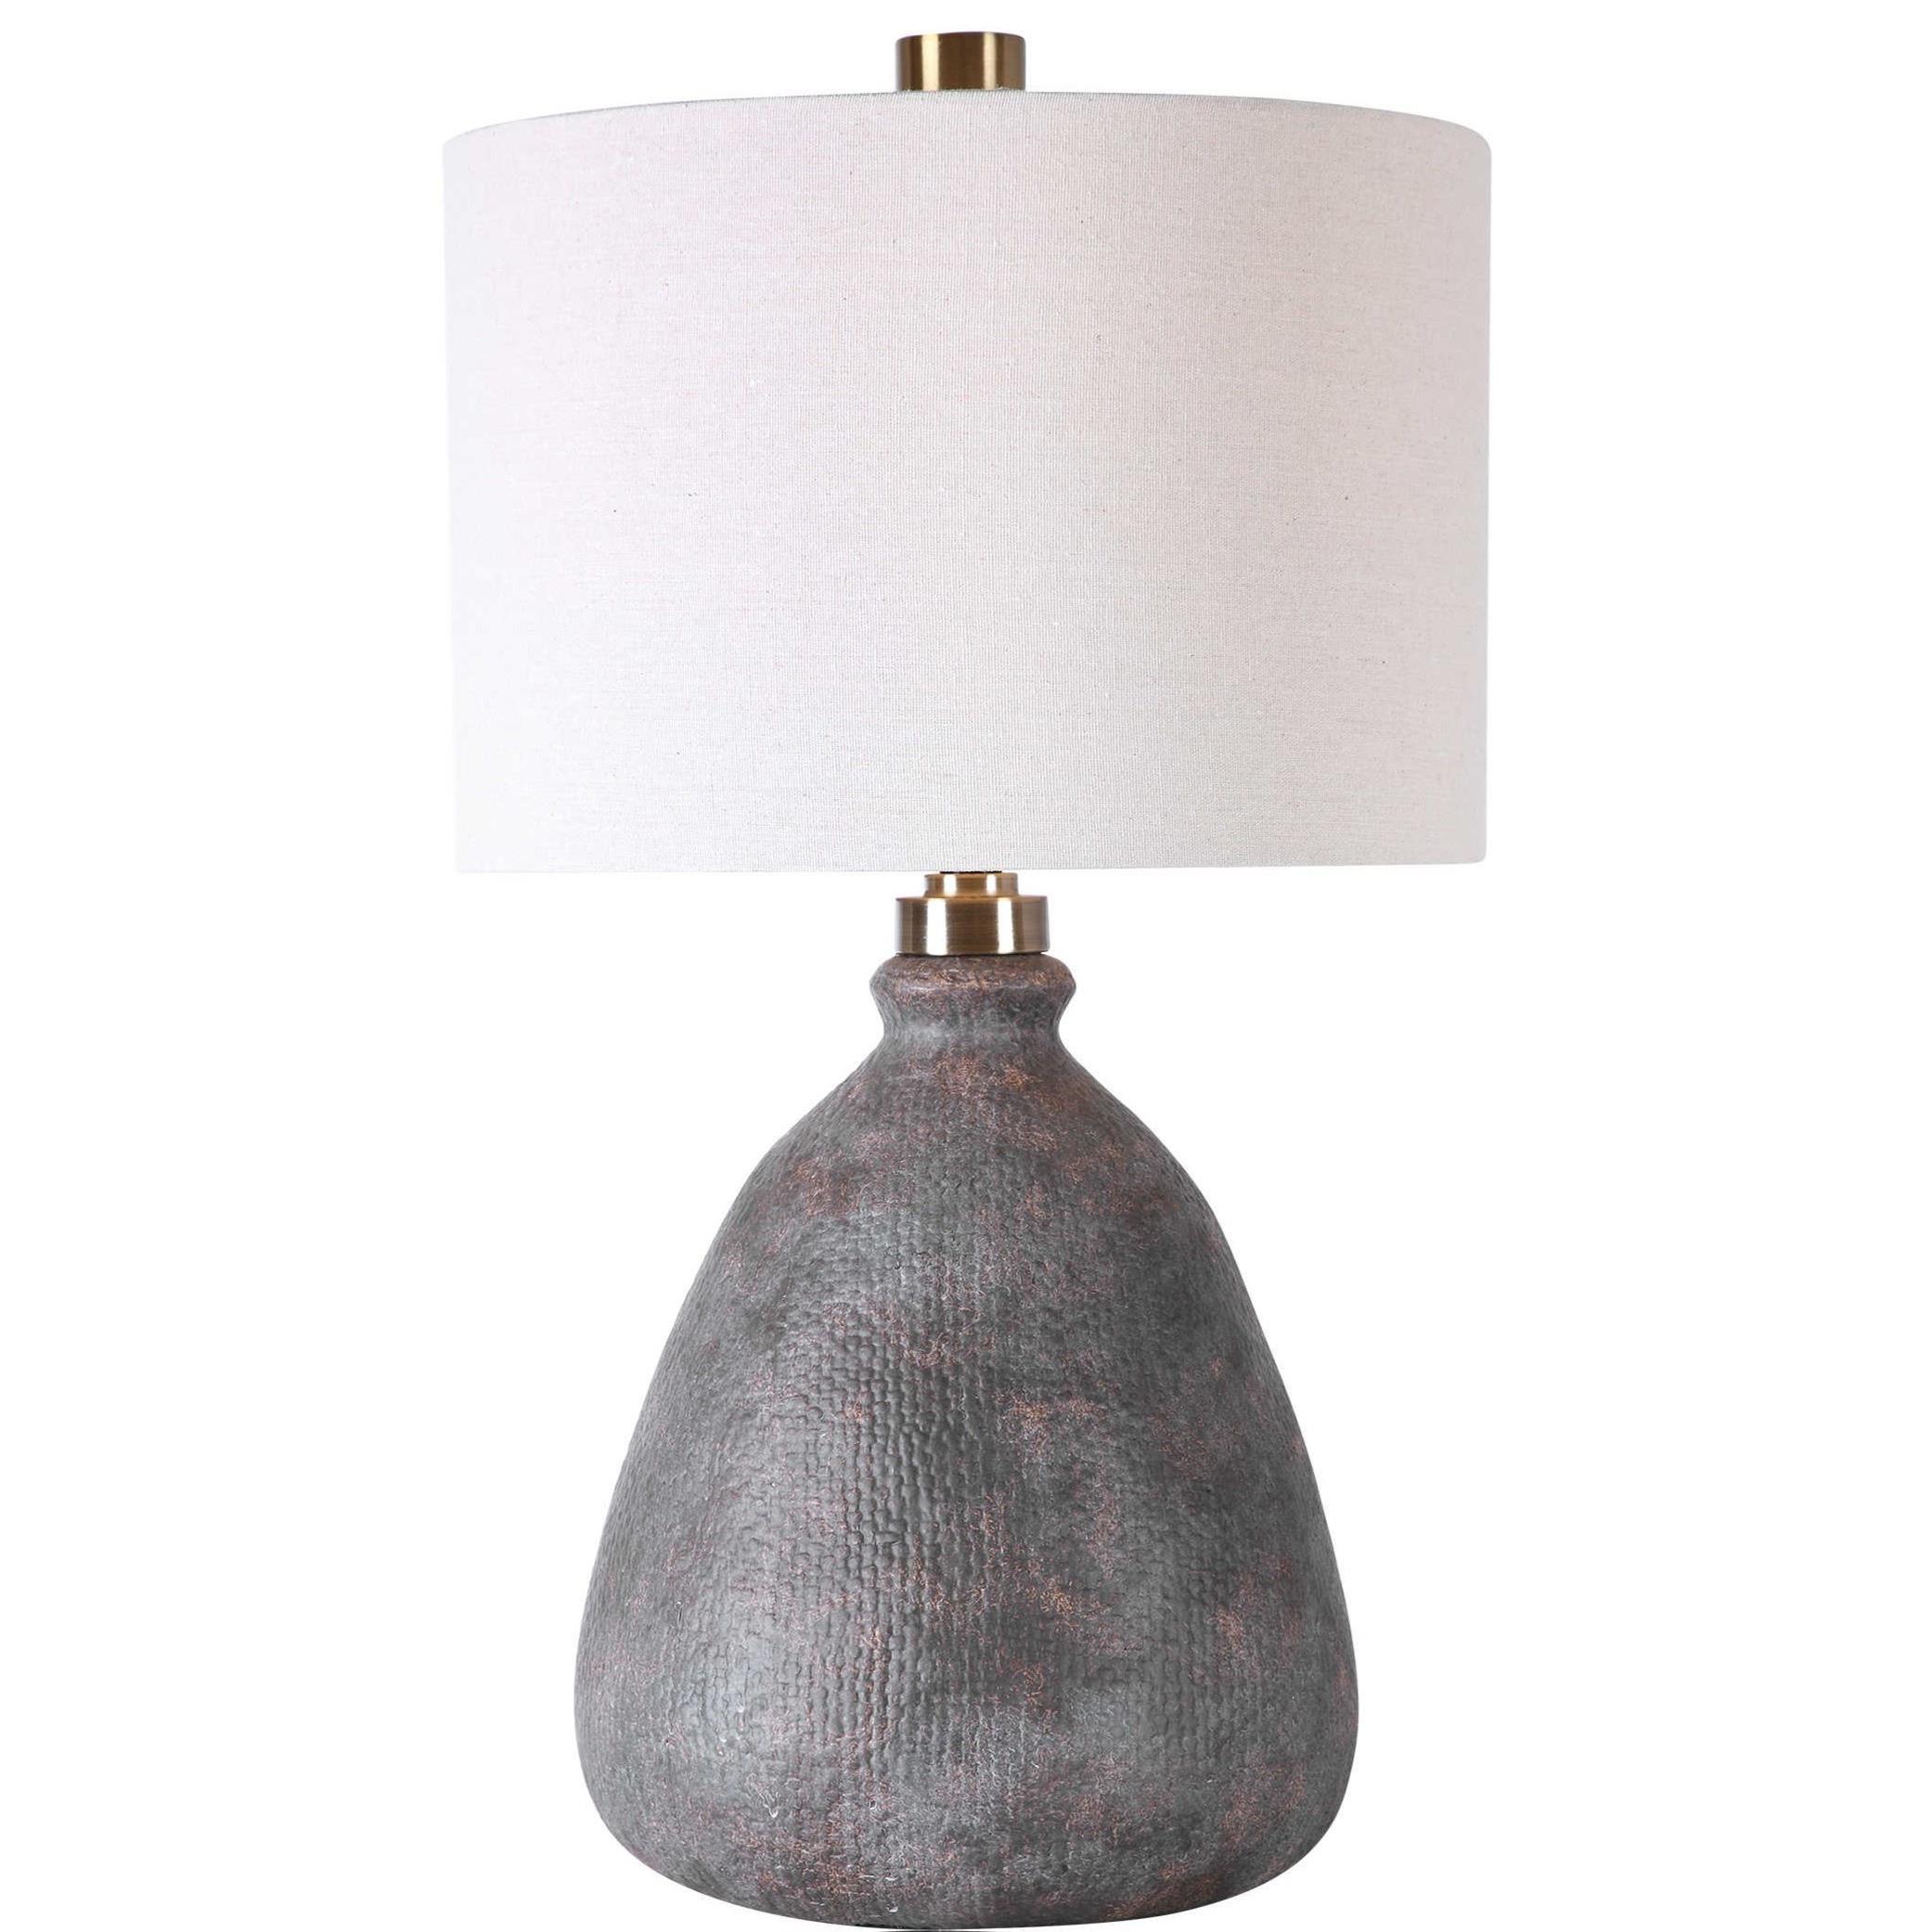 Bandera Distressed Table Lamp